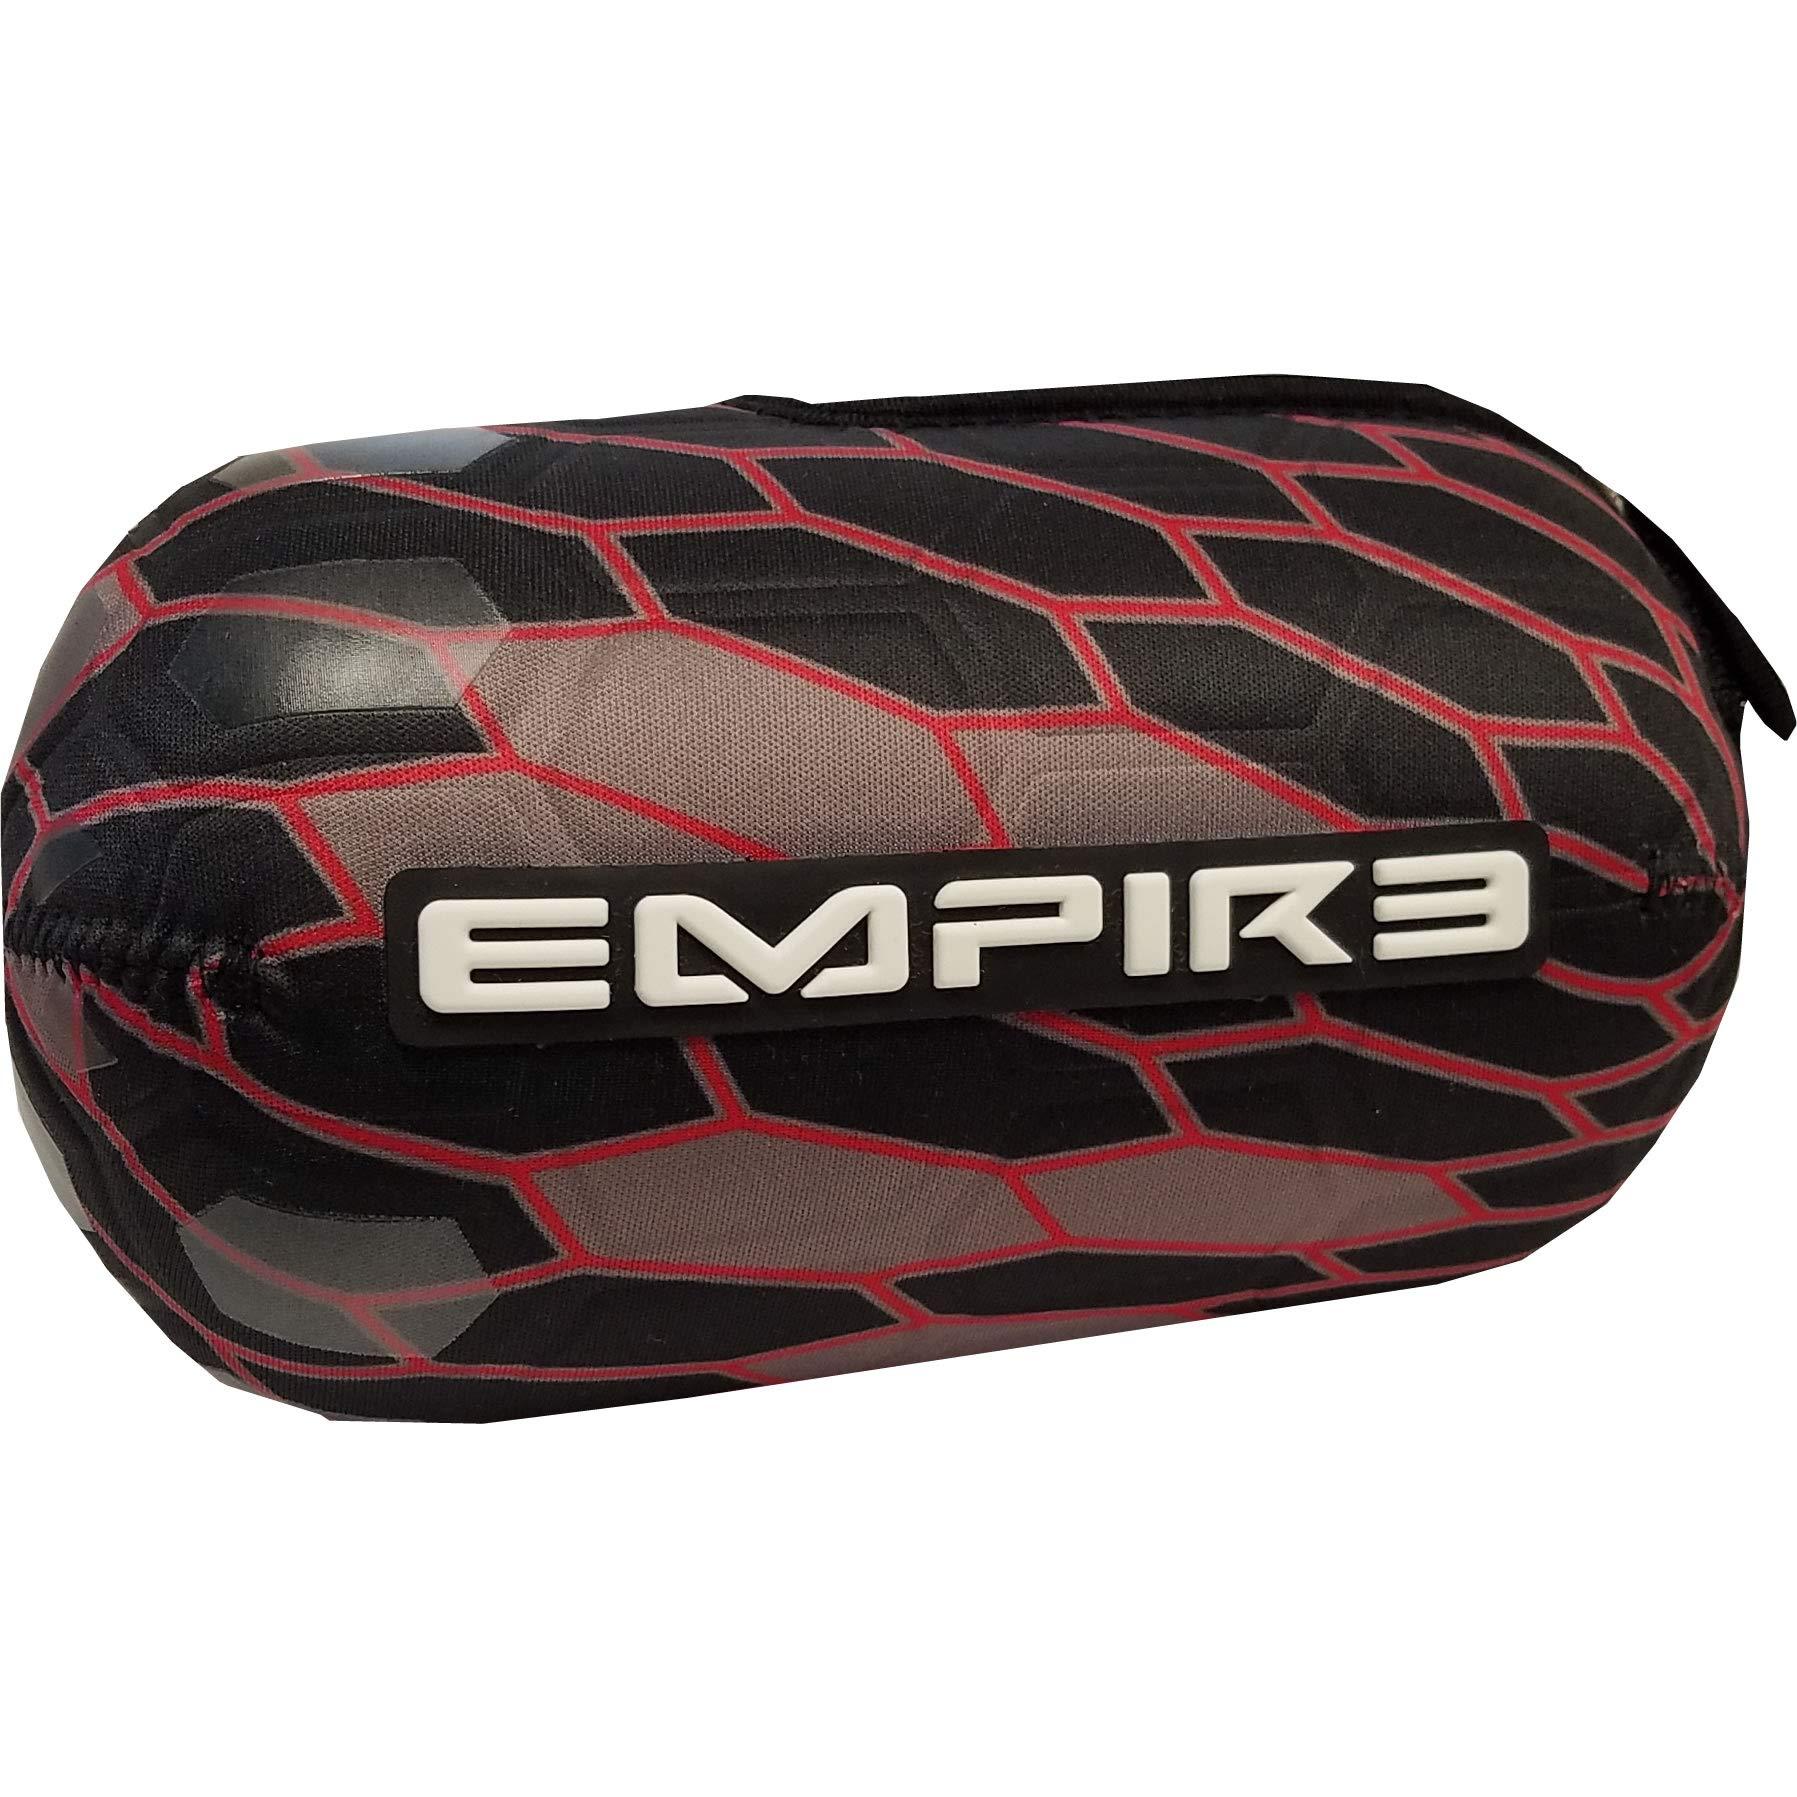 Empire Bottle Glove F9 (68/70ci, Black/Red) by Empire